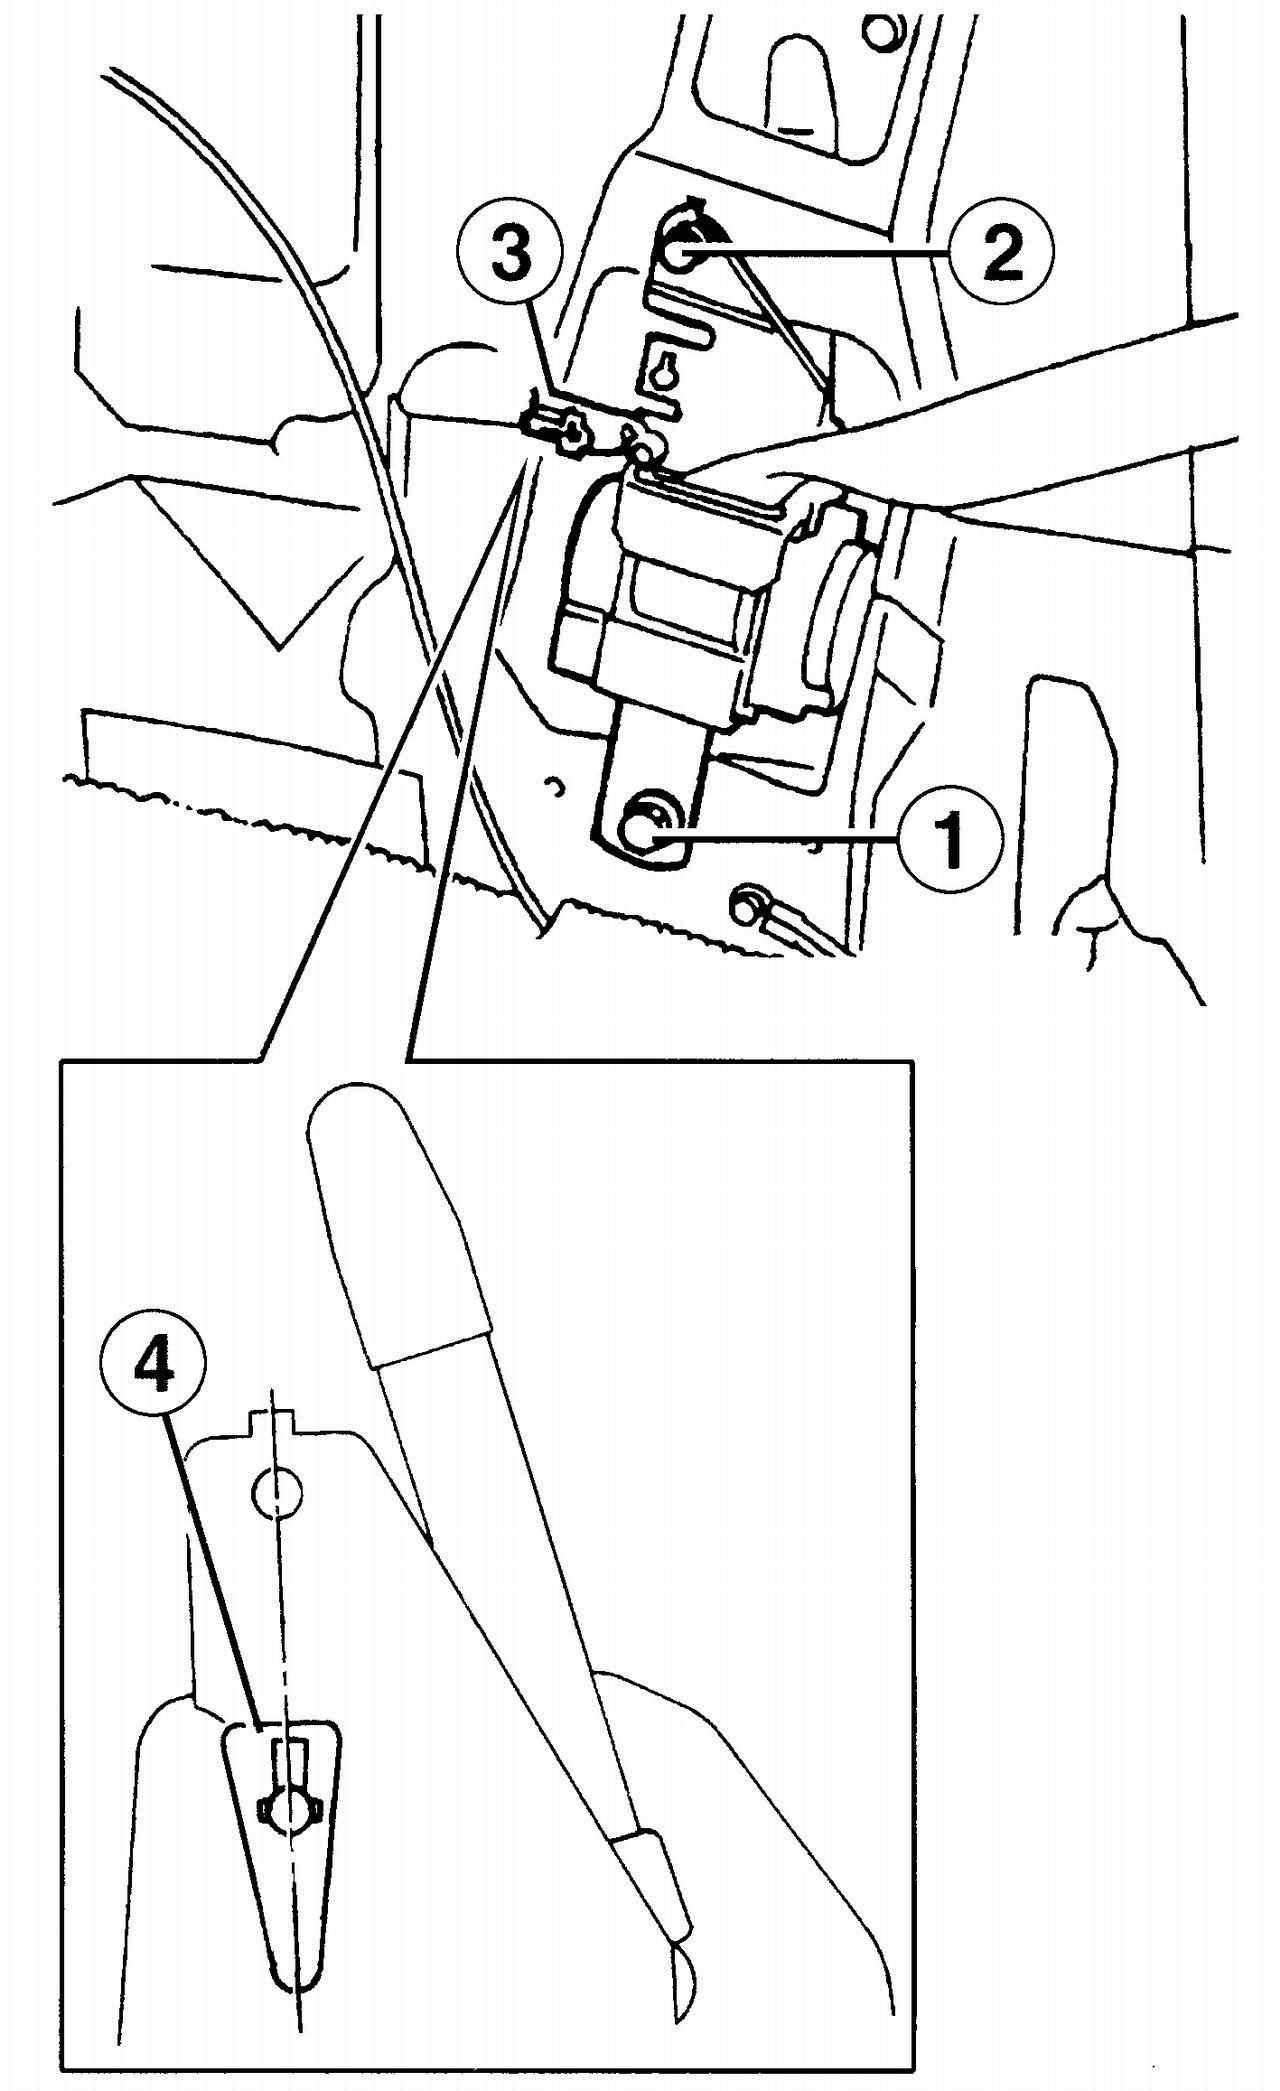 Ремень безопасности устройство 7